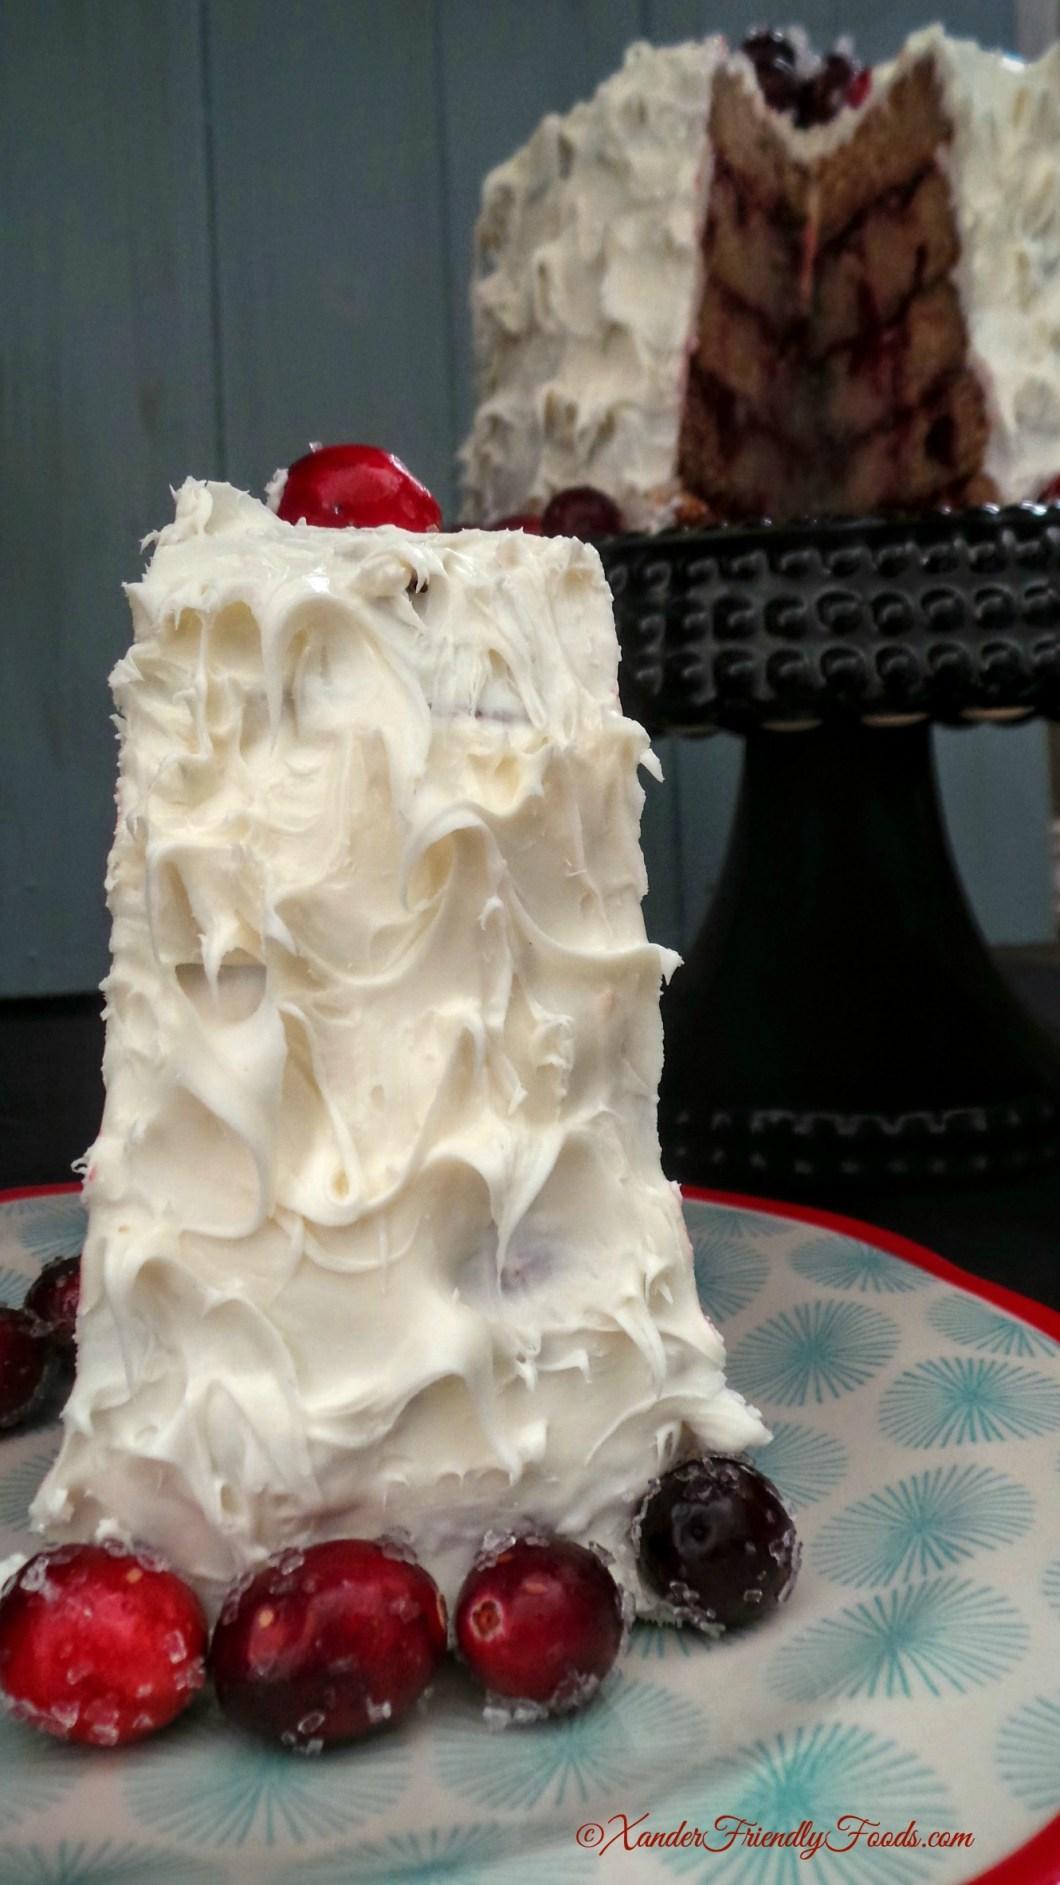 Cake served